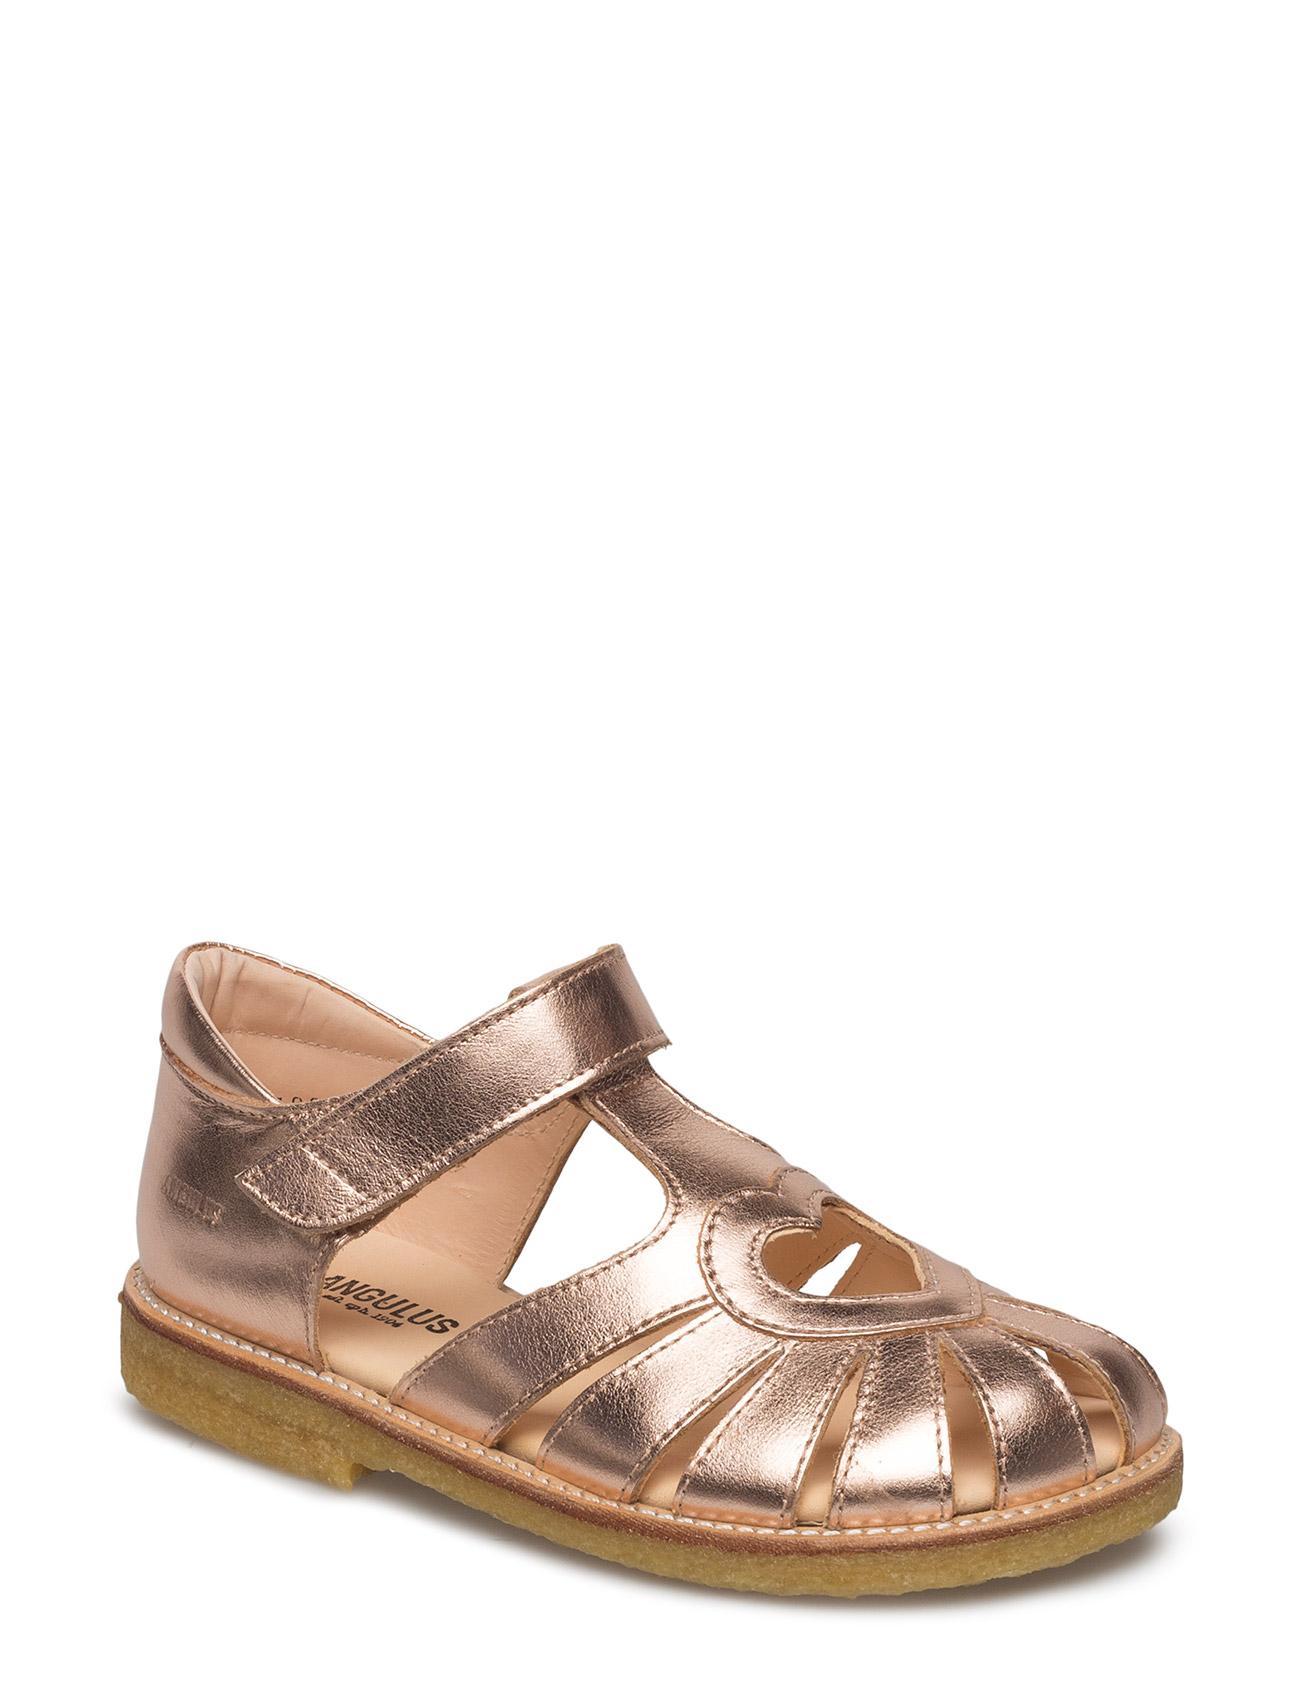 Sandal With Heart Detail Sandaler Guld ANGULUS